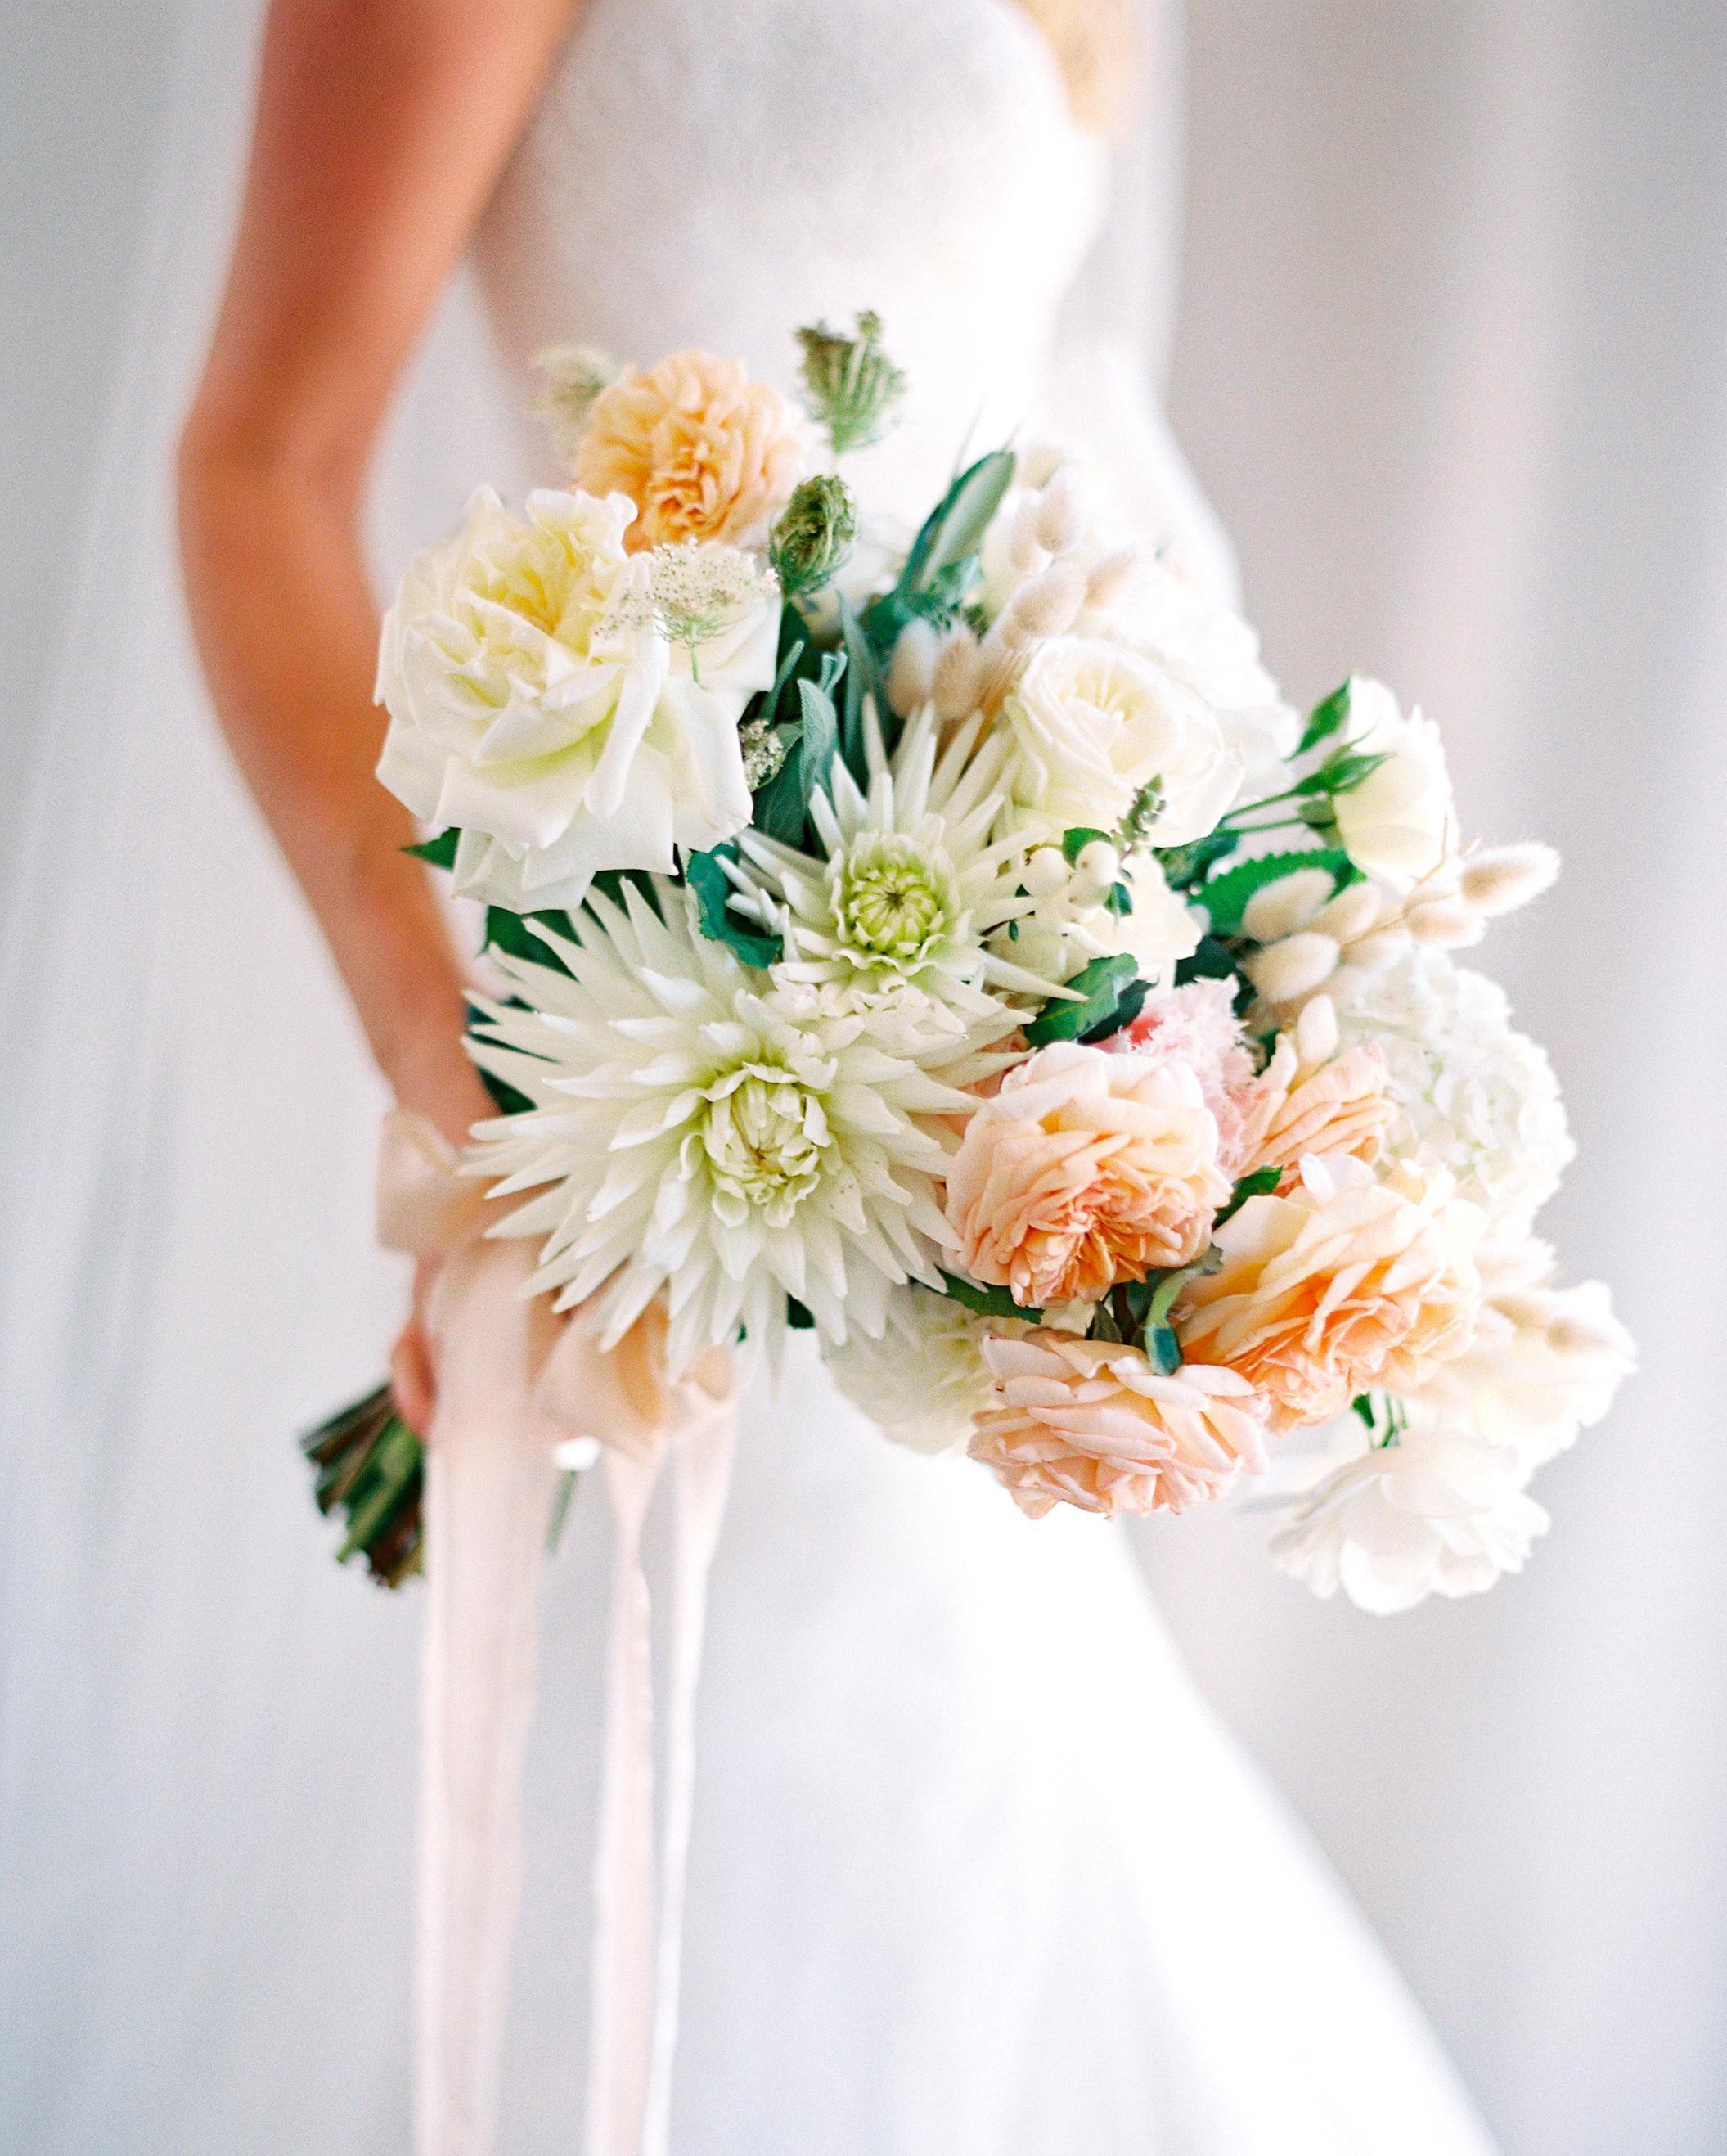 jemma-michael-wedding-bouquet-002582013-s112110-0815.jpg